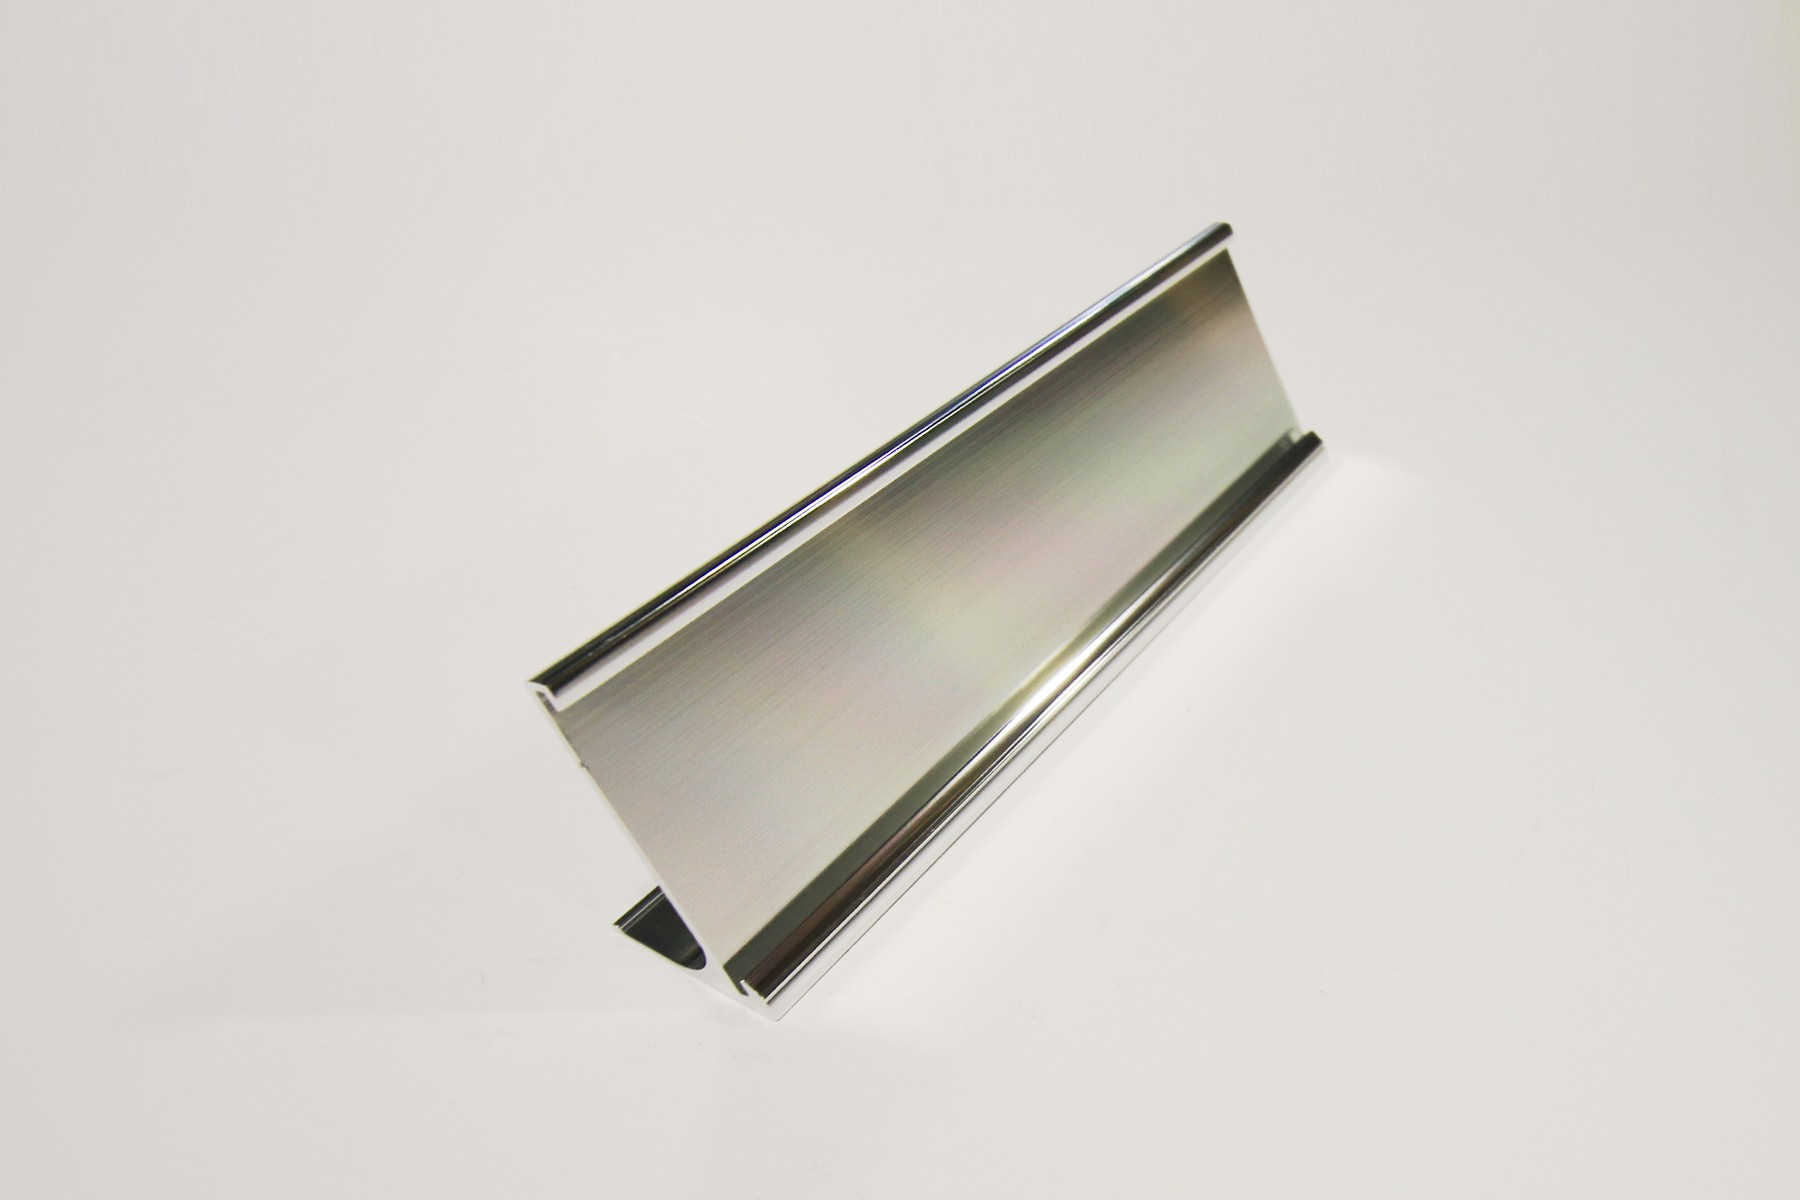 2 x 8 Desk Holder, Silver